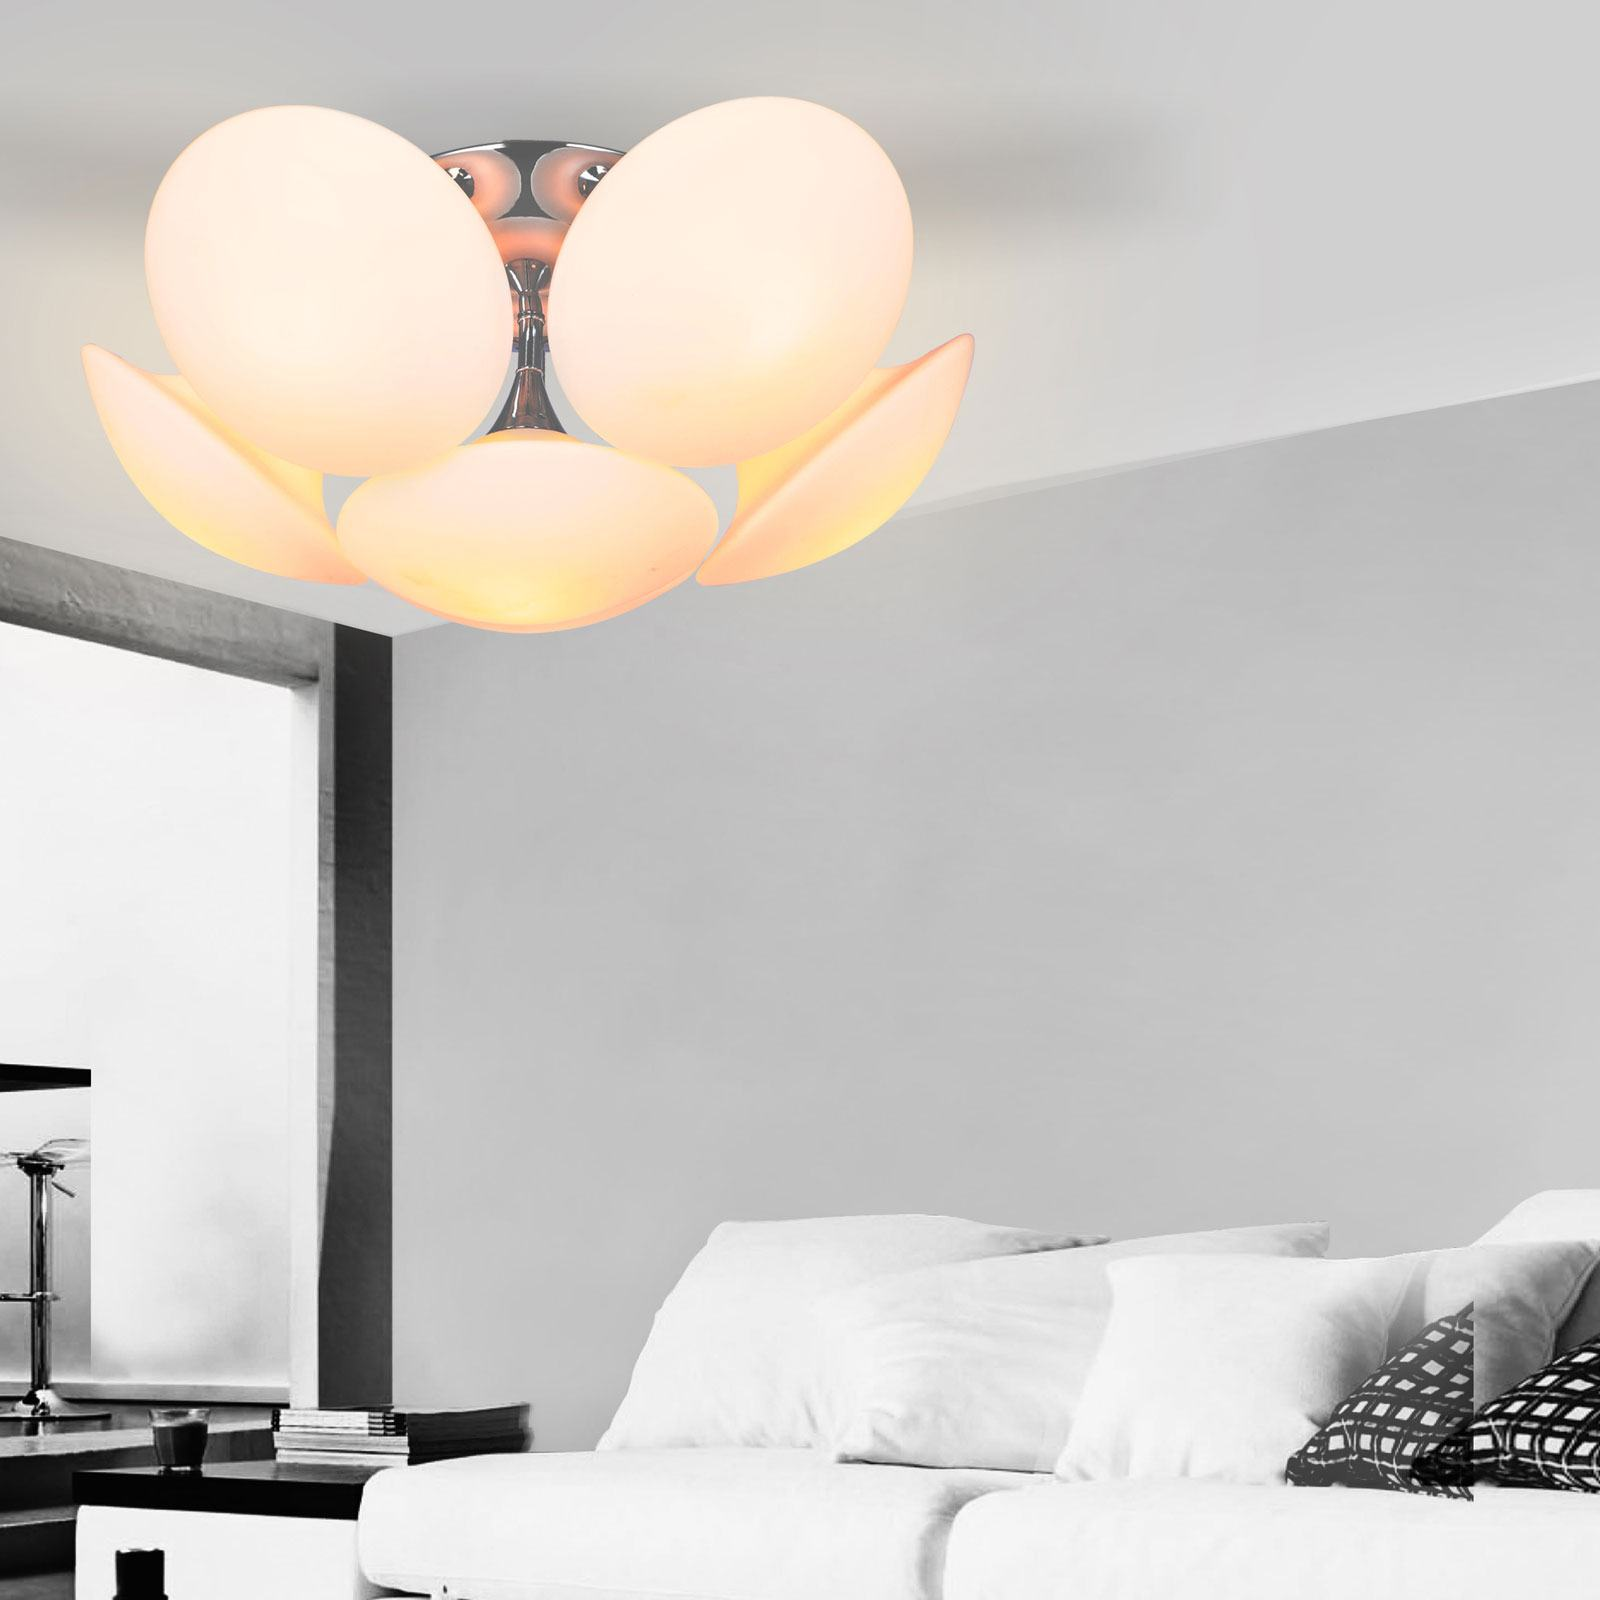 Full Size of Wohnzimmer Led Design Deckenlampe 6 Falmmig Deckenleuchte Glas Fototapeten Echtleder Sofa Hängelampe Lampen Spot Garten Bad Spiegelschrank Moderne Wohnzimmer Wohnzimmer Led